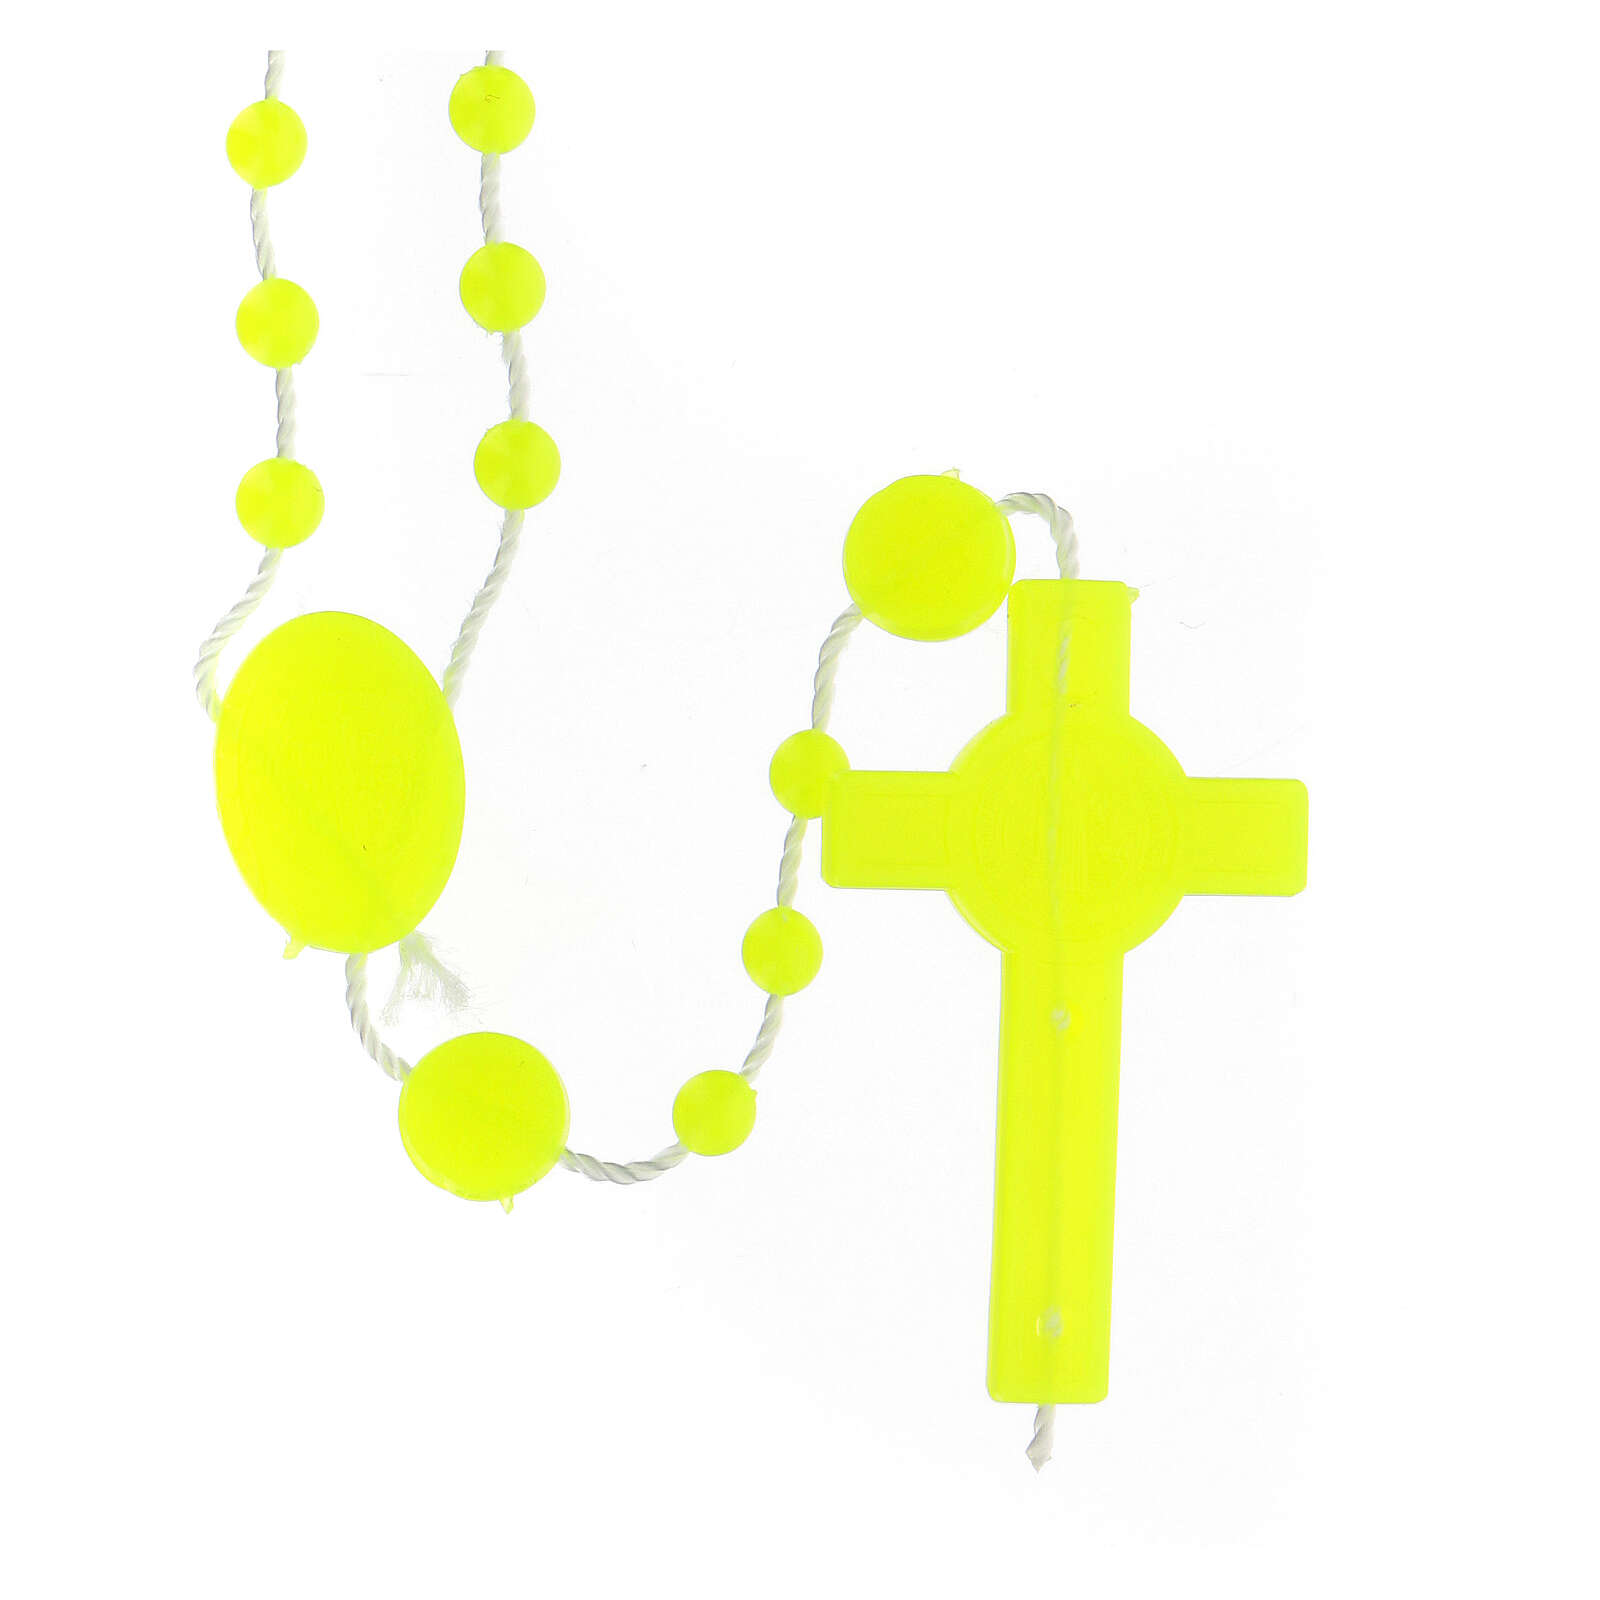 STOCK Chapelet jaune fluo St Benoît 4 mm nylon 4